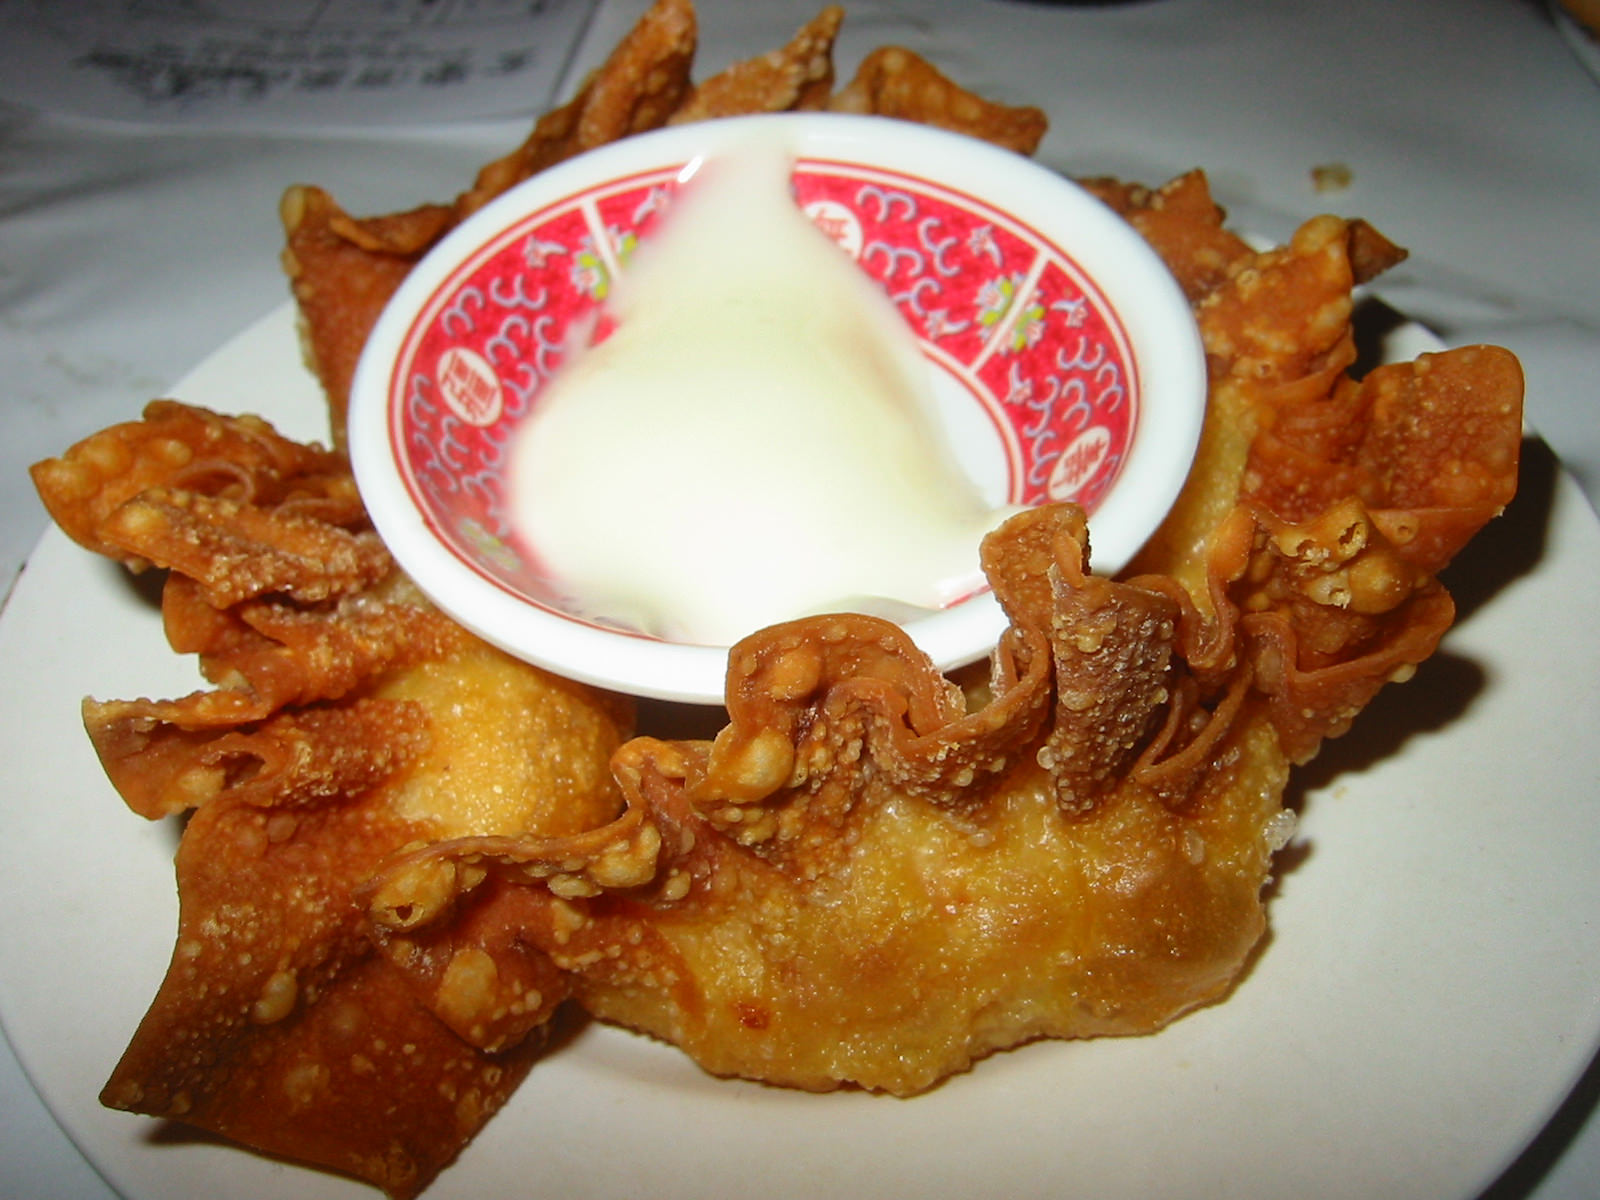 Deep fried prawn dumplings with mayonnaise